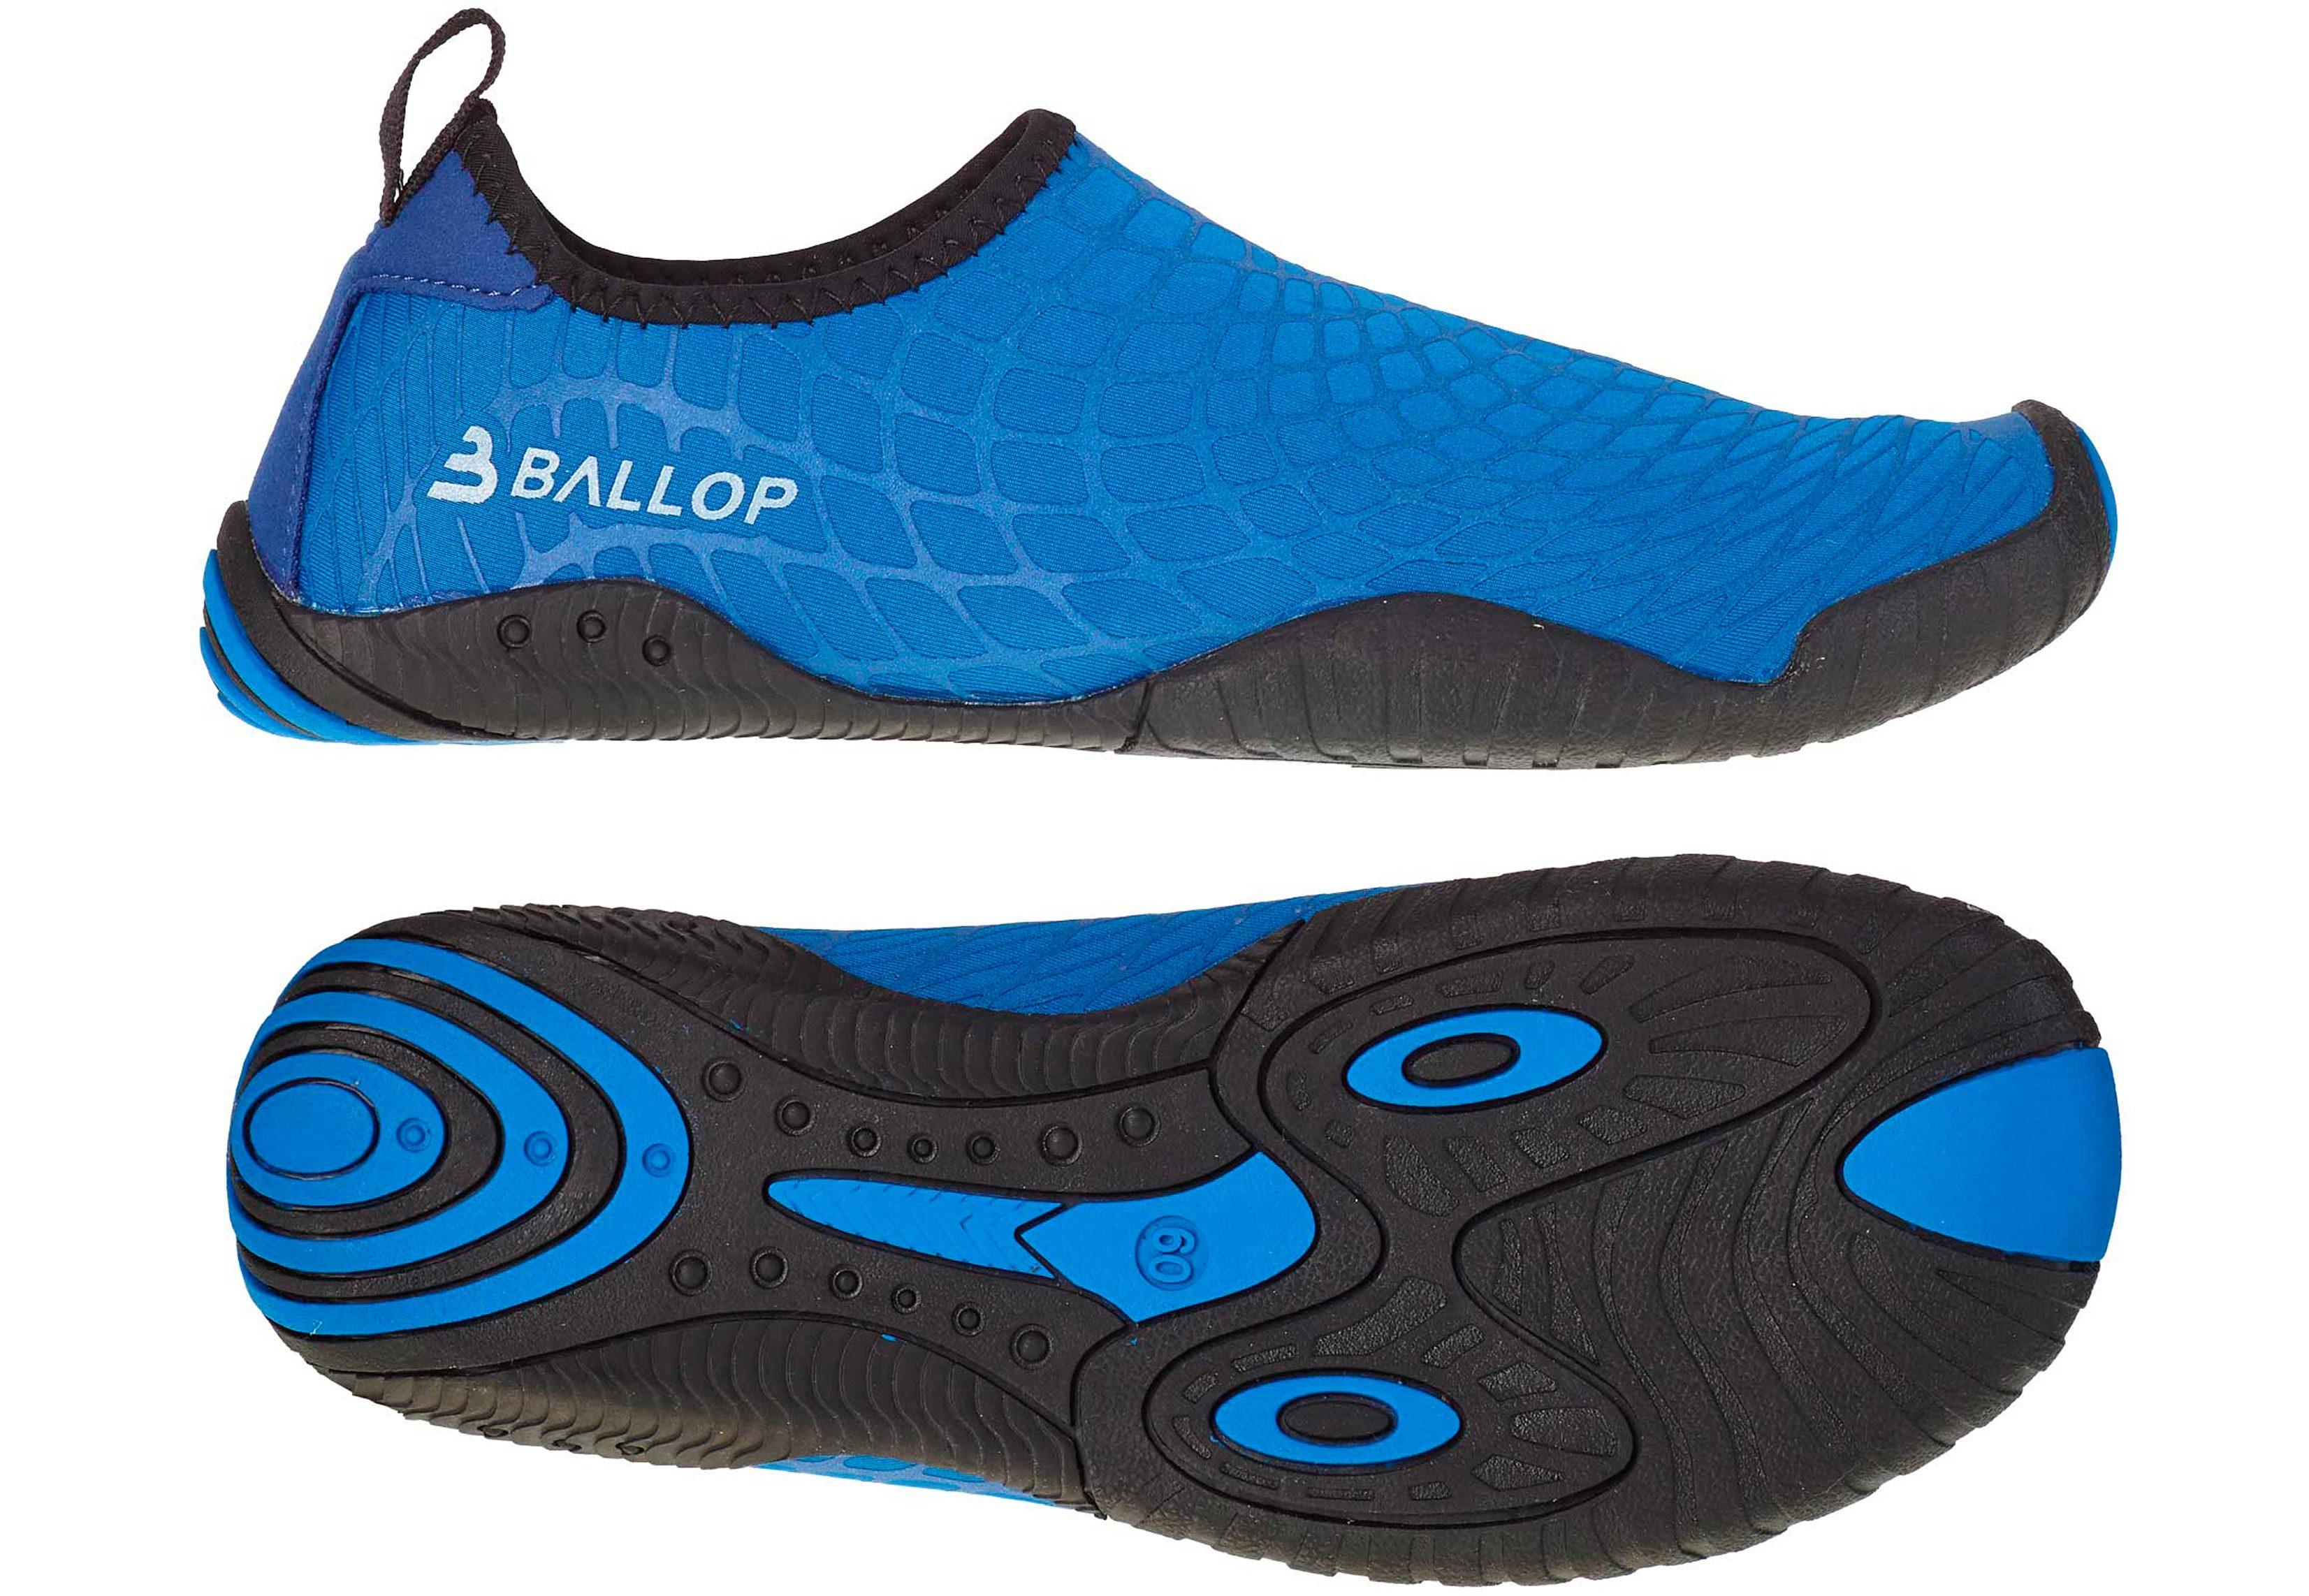 Ballop Barefootschoenen »Spider zwart«